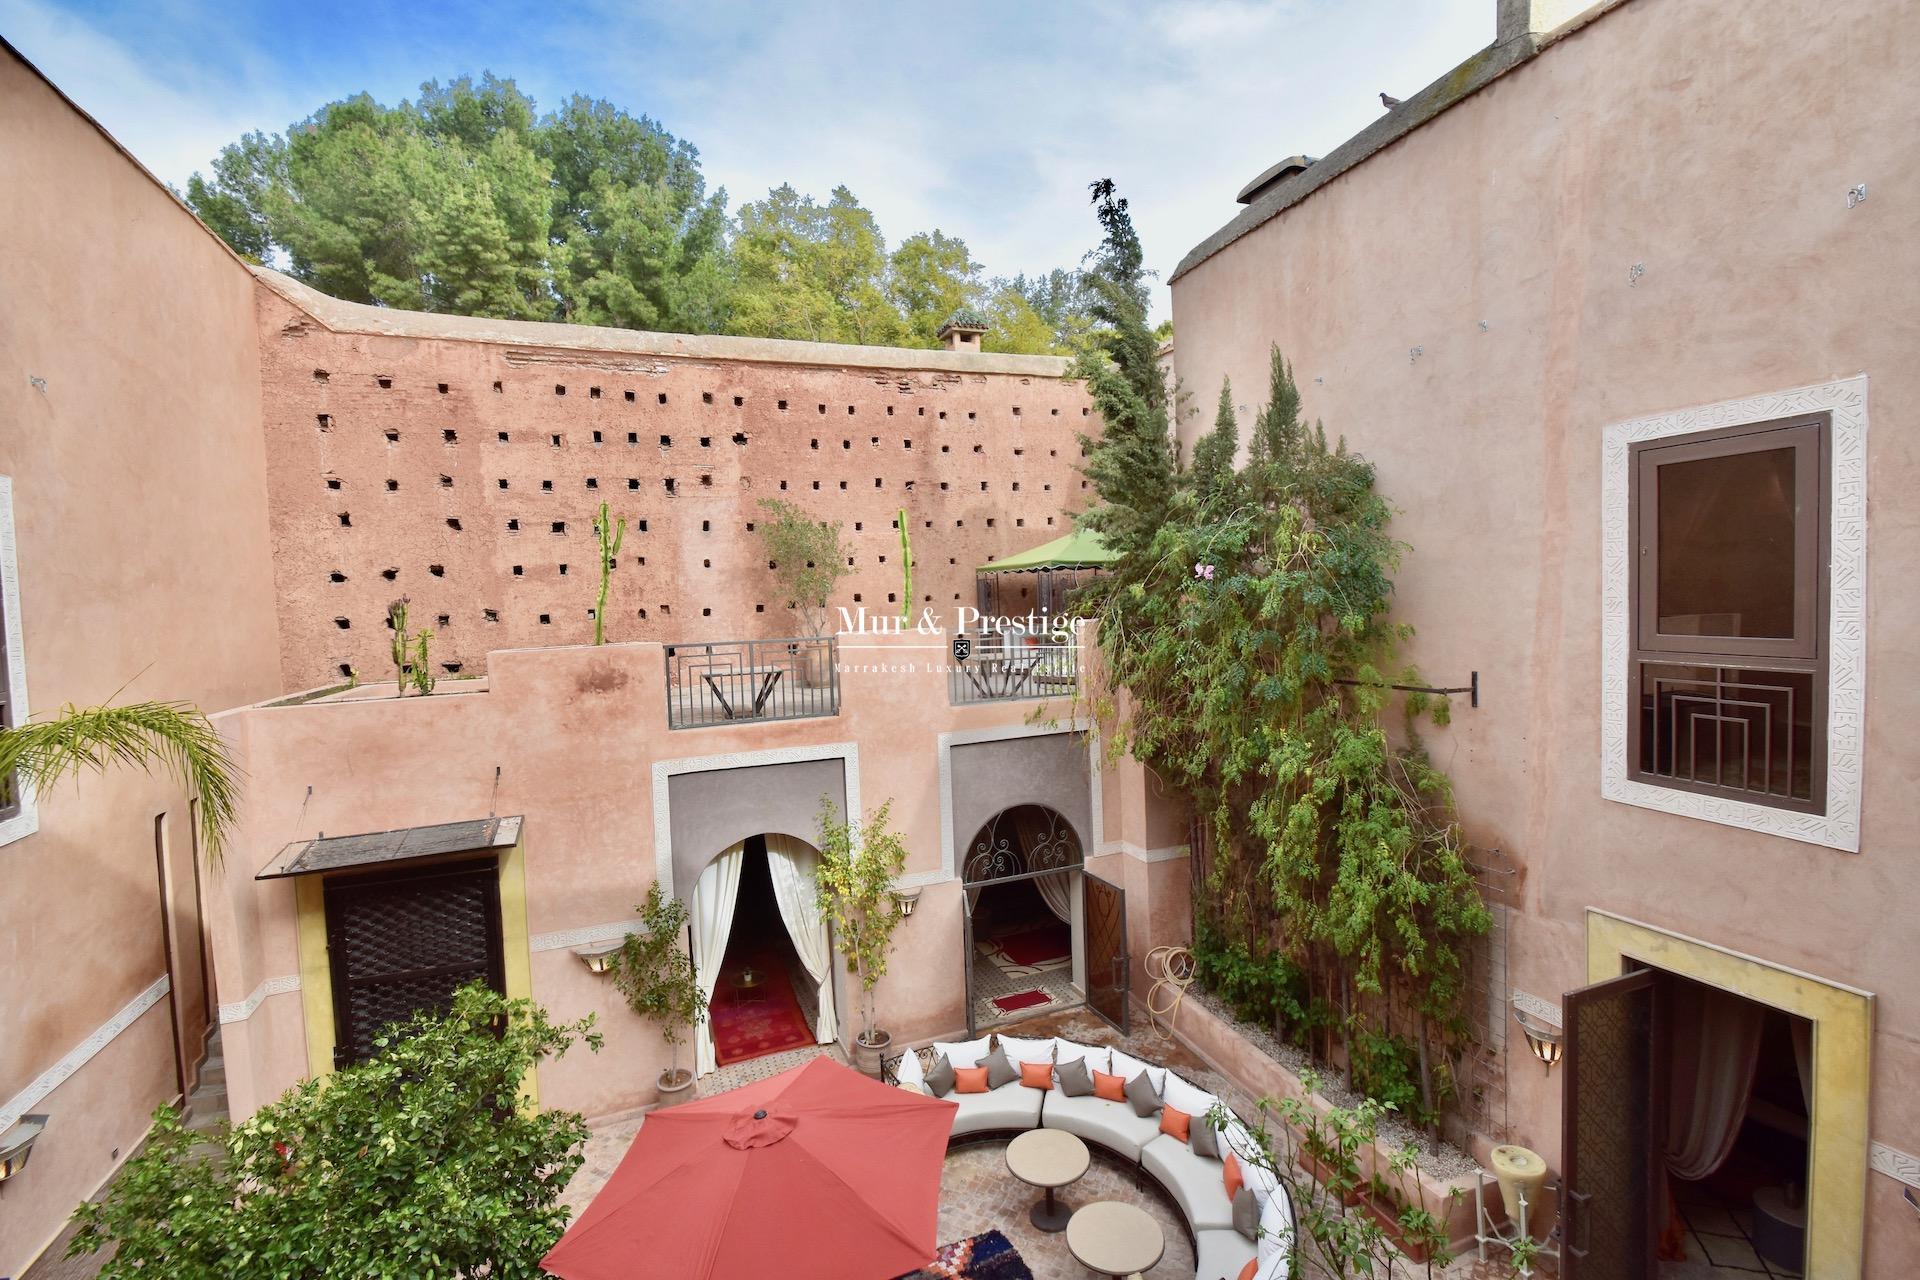 Riad à vendre dans la Médina de Marrakech